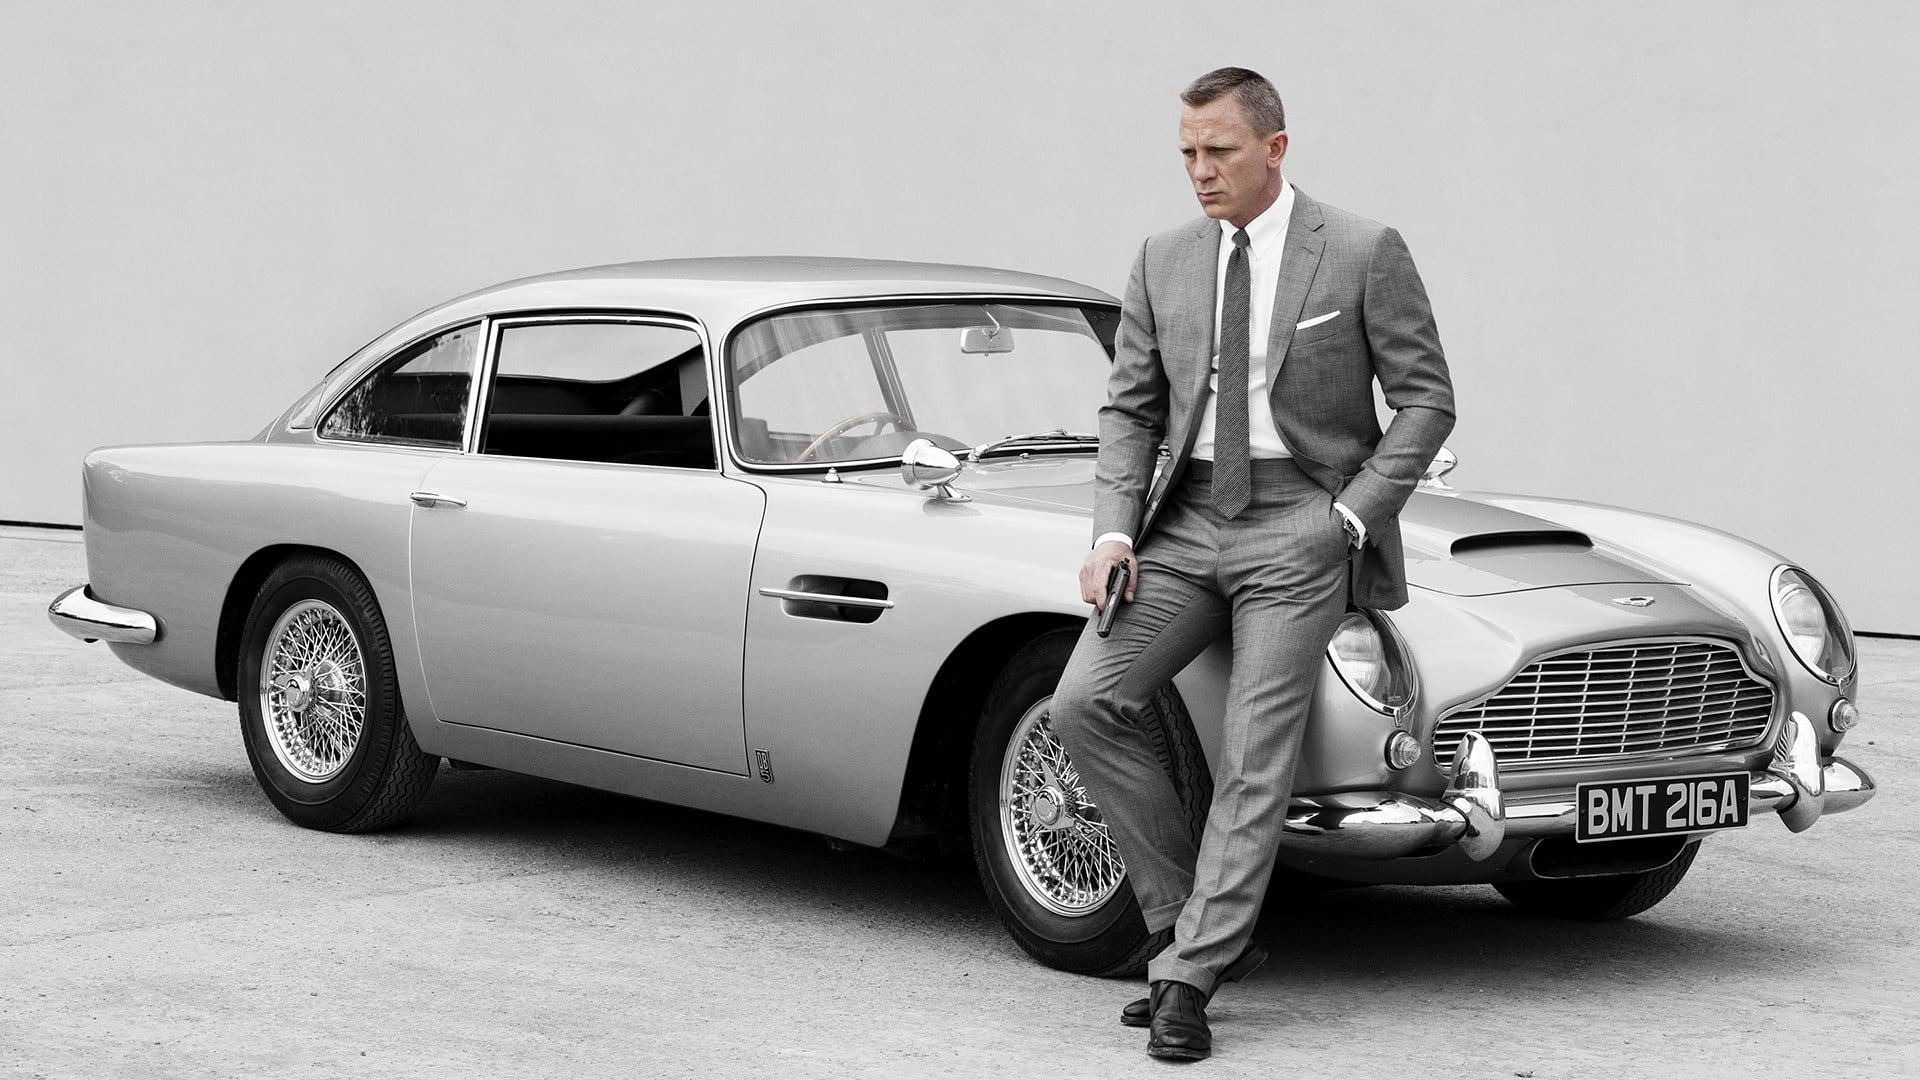 the bond cars! james bond cars part 1 - carlassic